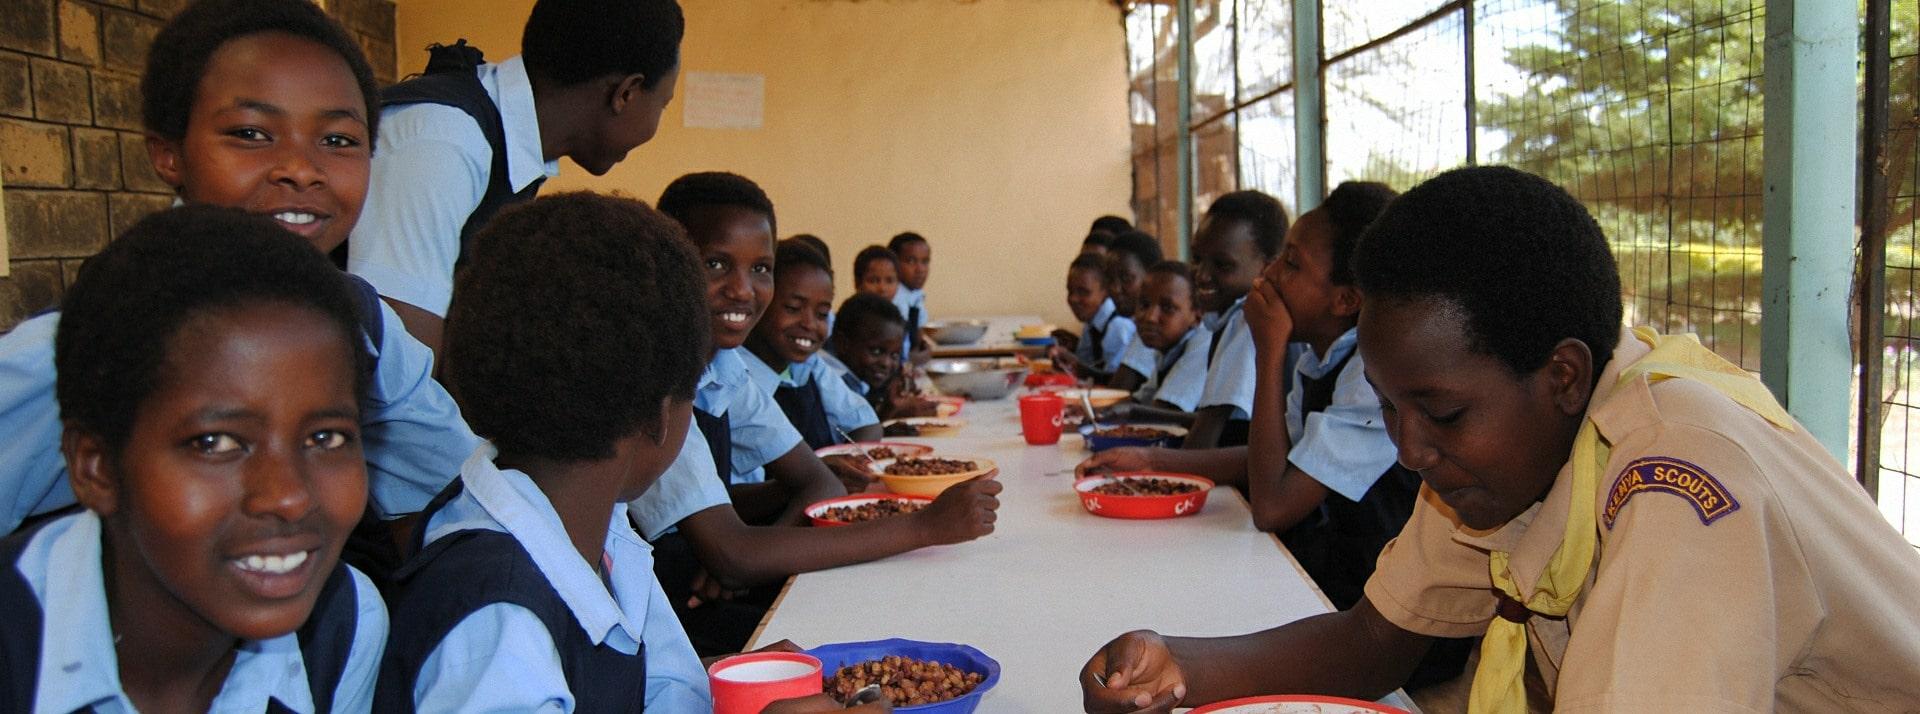 We support education for children in Kenya